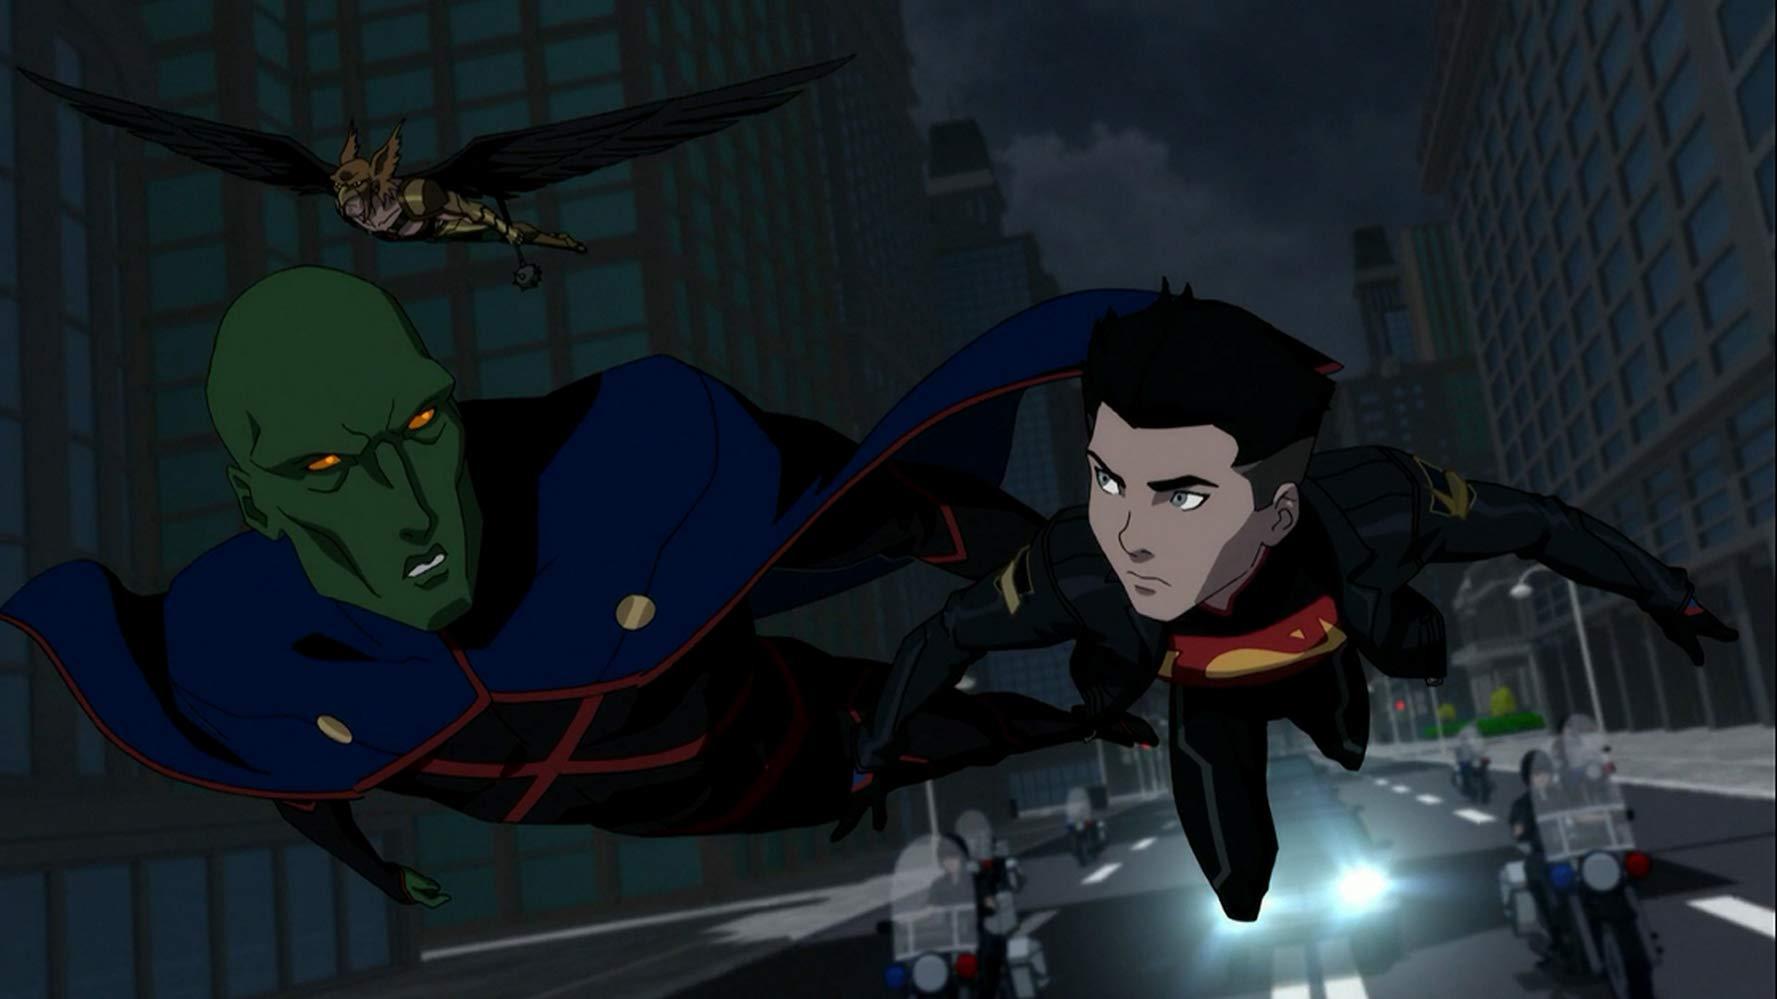 نقد انیمیشن Reign of the Supermen